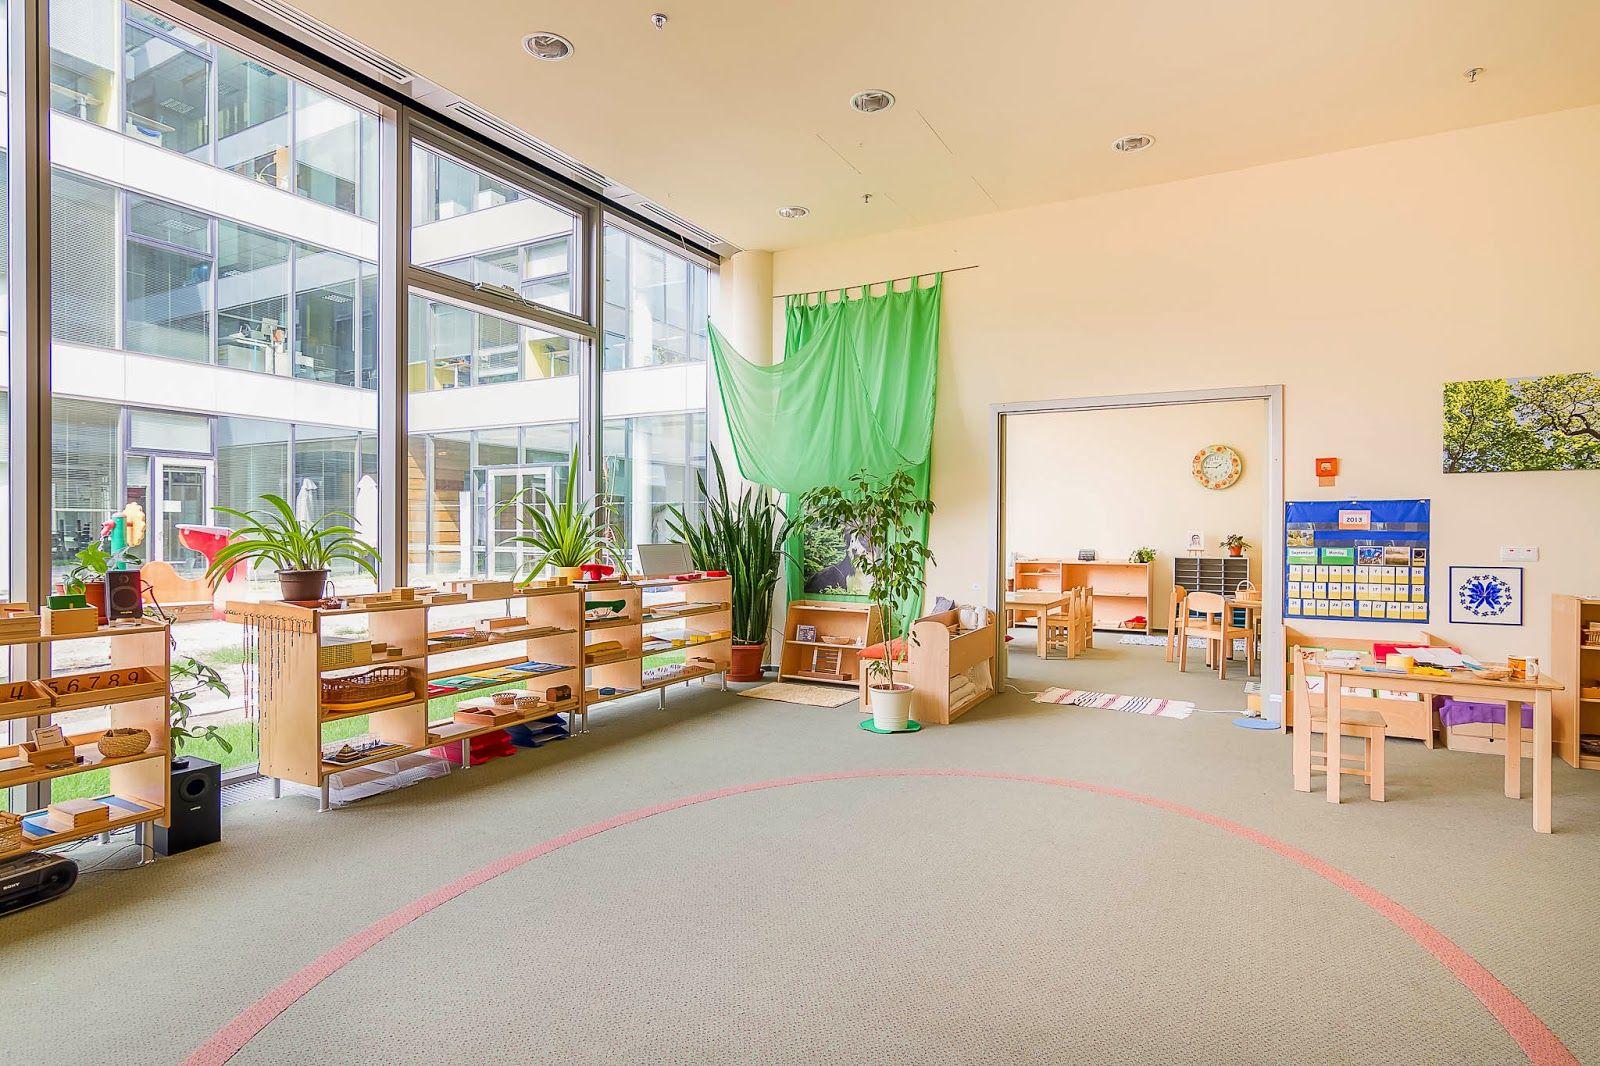 Martin Wilczek Blog How To Build A Preschool According Feng Shui Principles RoomsMontessori PreschoolMontessori Classroom LayoutPreschool